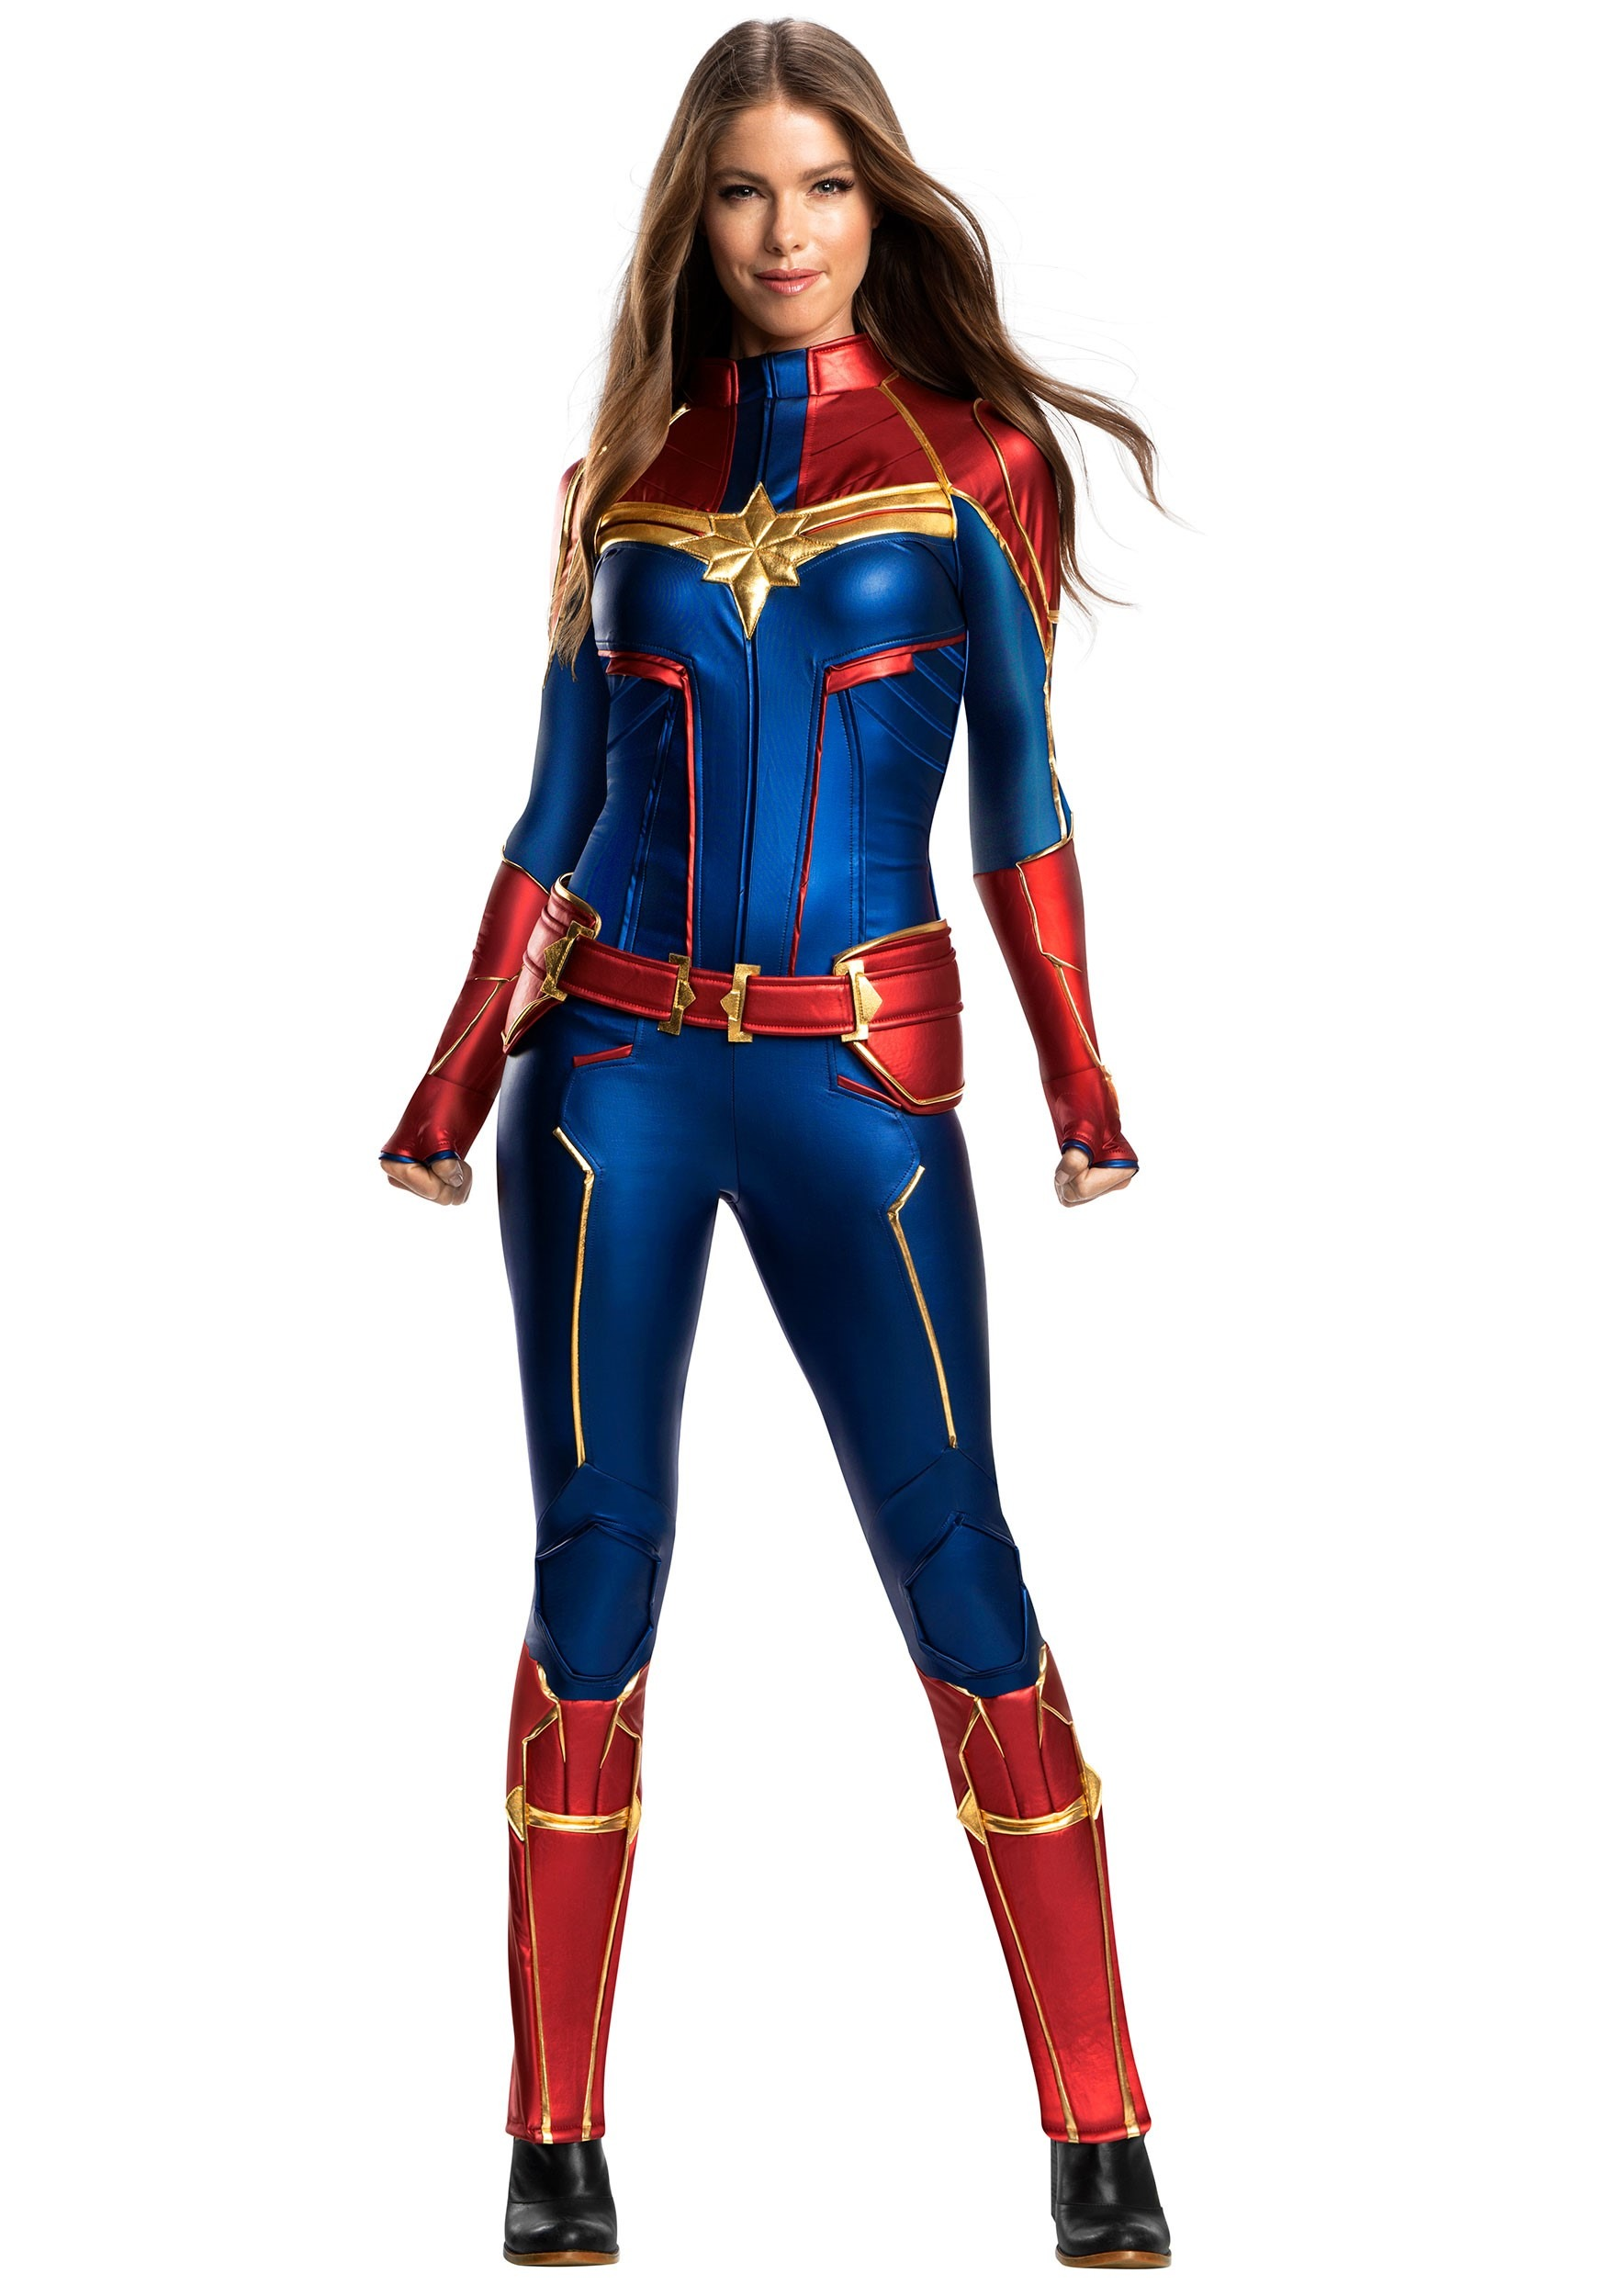 Captain Marvel Grand Heritage Costume For Women 4.4 out of 5 stars 9. women s captain marvel grand heritage costume